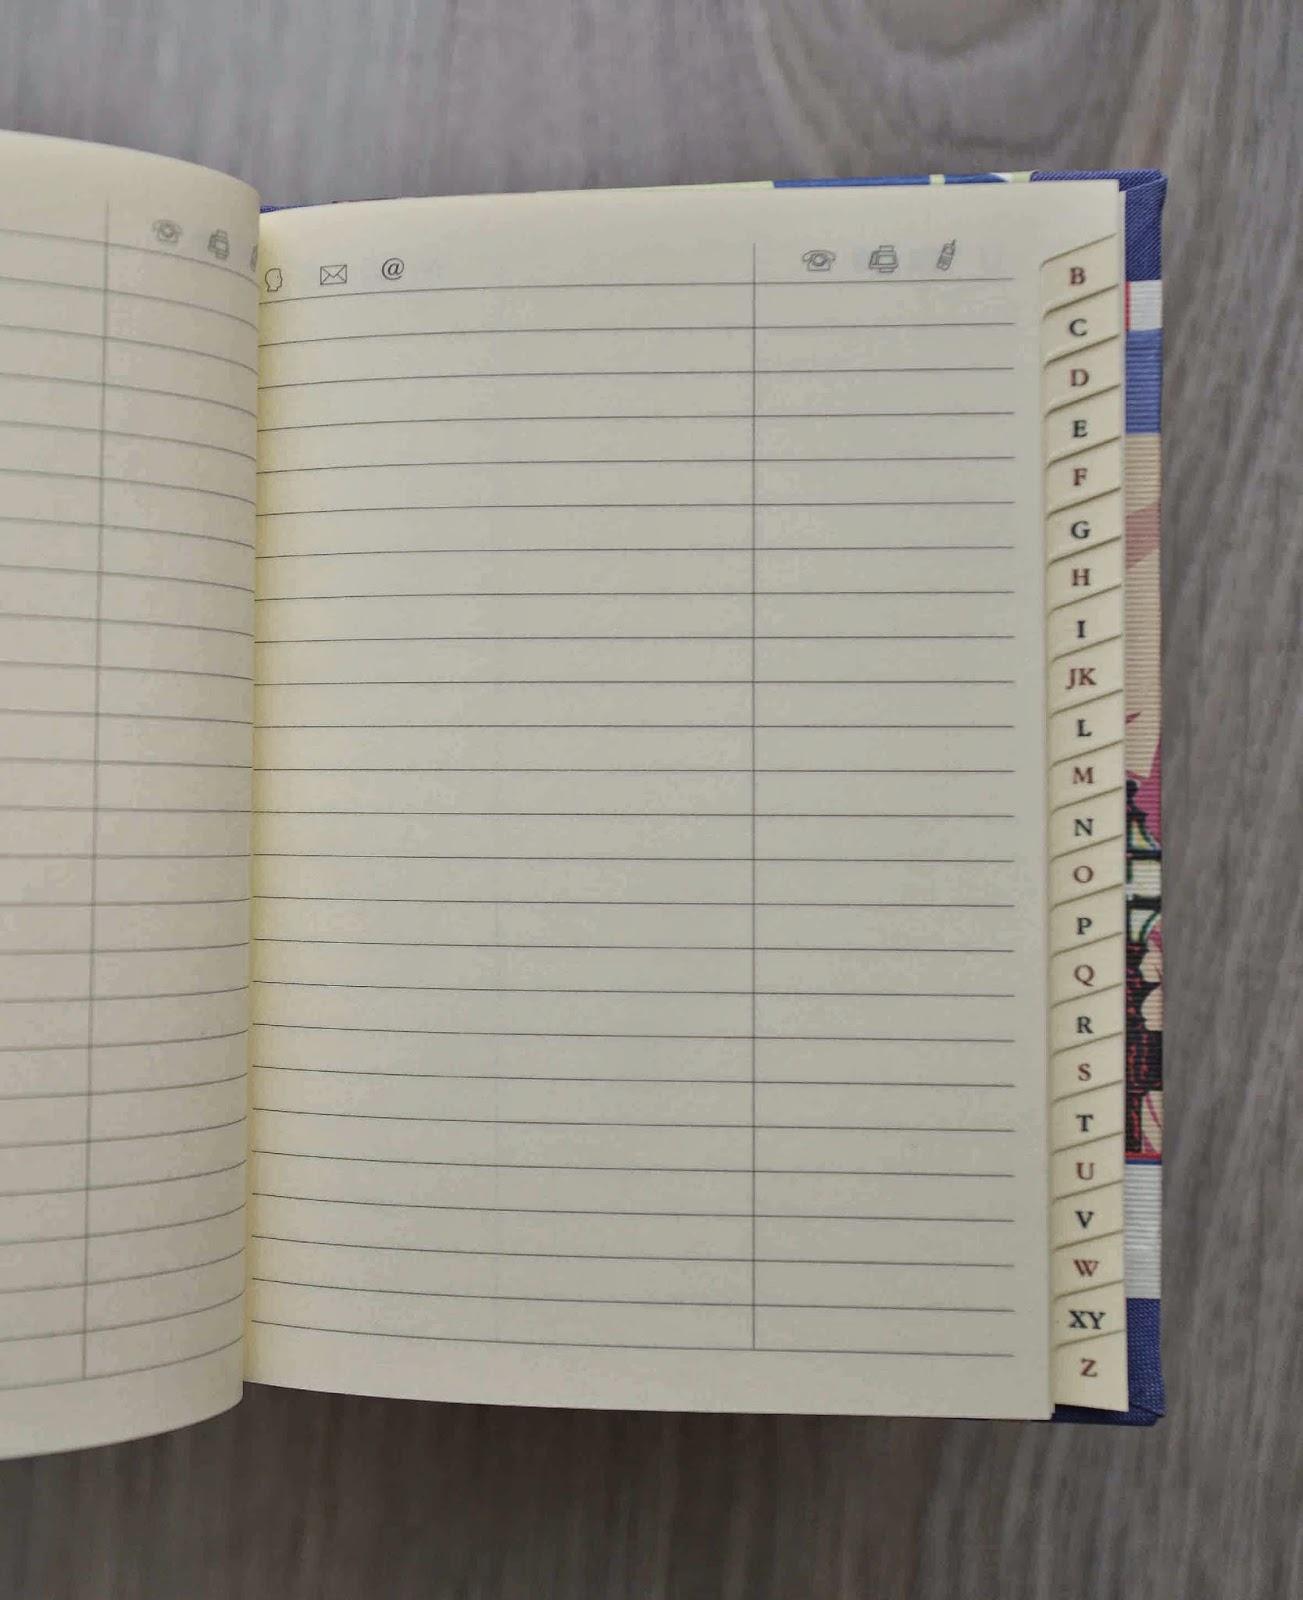 suitbook, listin telefonico, encuadernacion, bookbinding